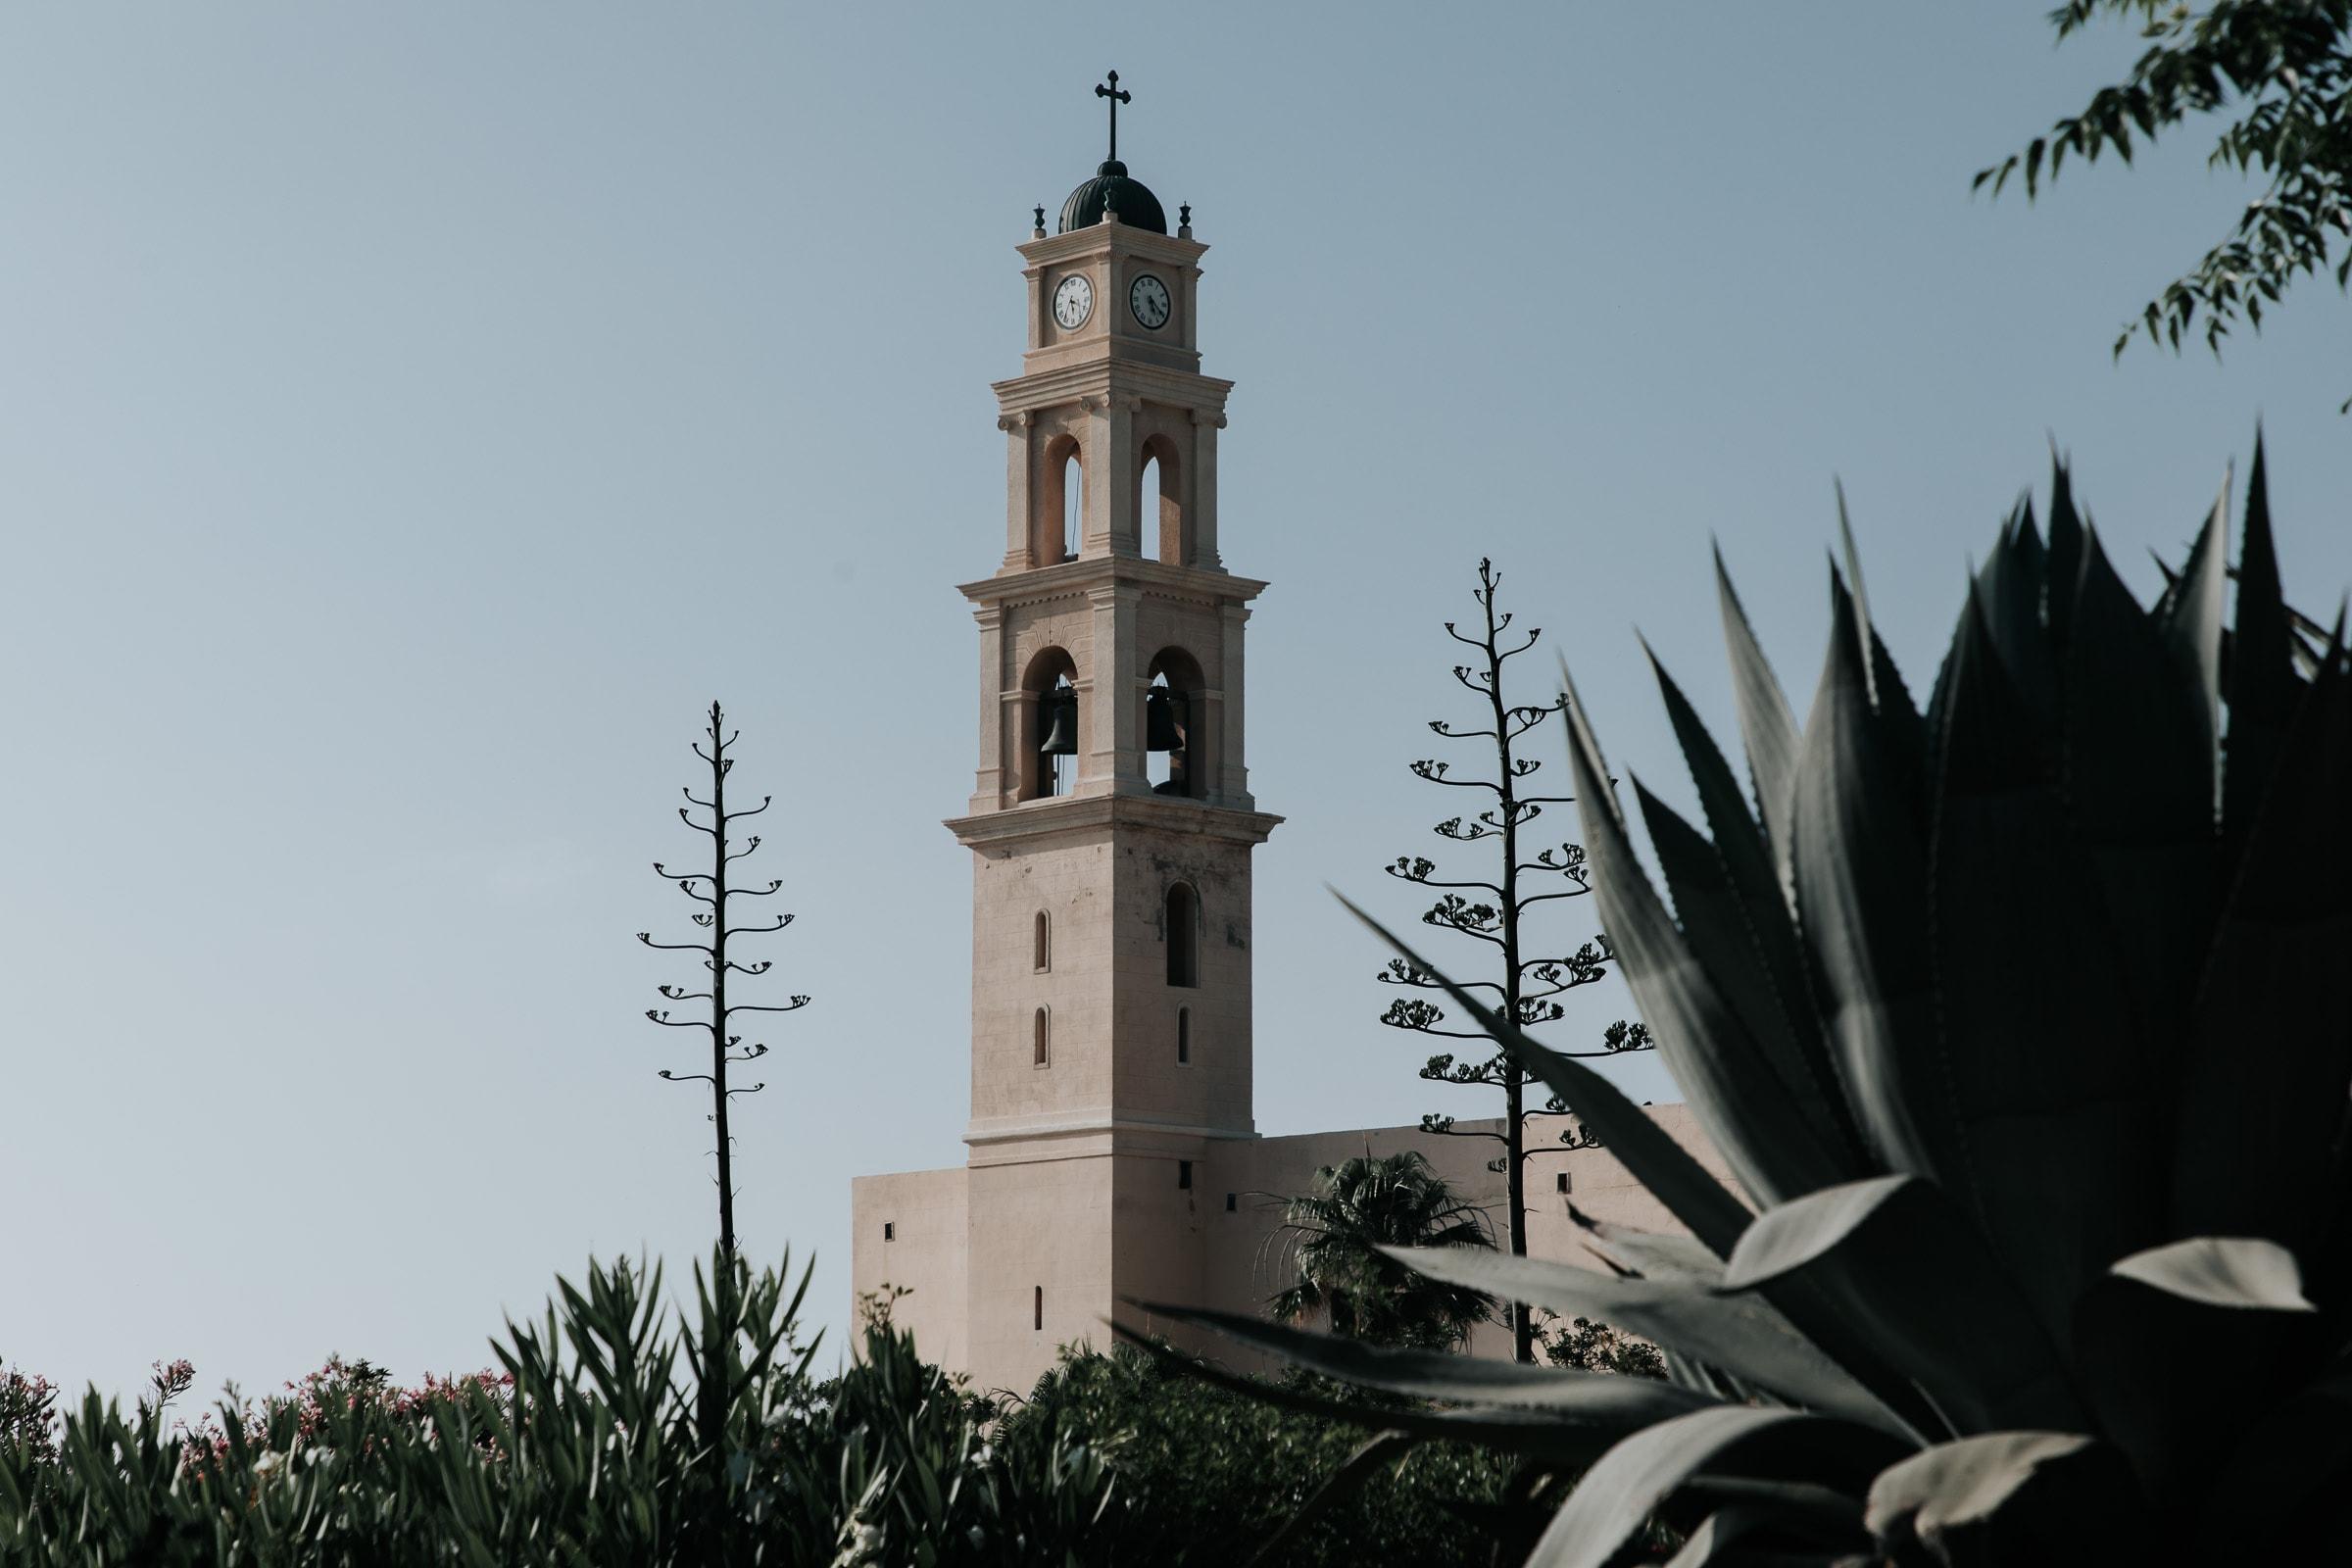 Tel Aviv Sehenswürdigkeiten Old Jaffa St Peter Kirche Uhrturm